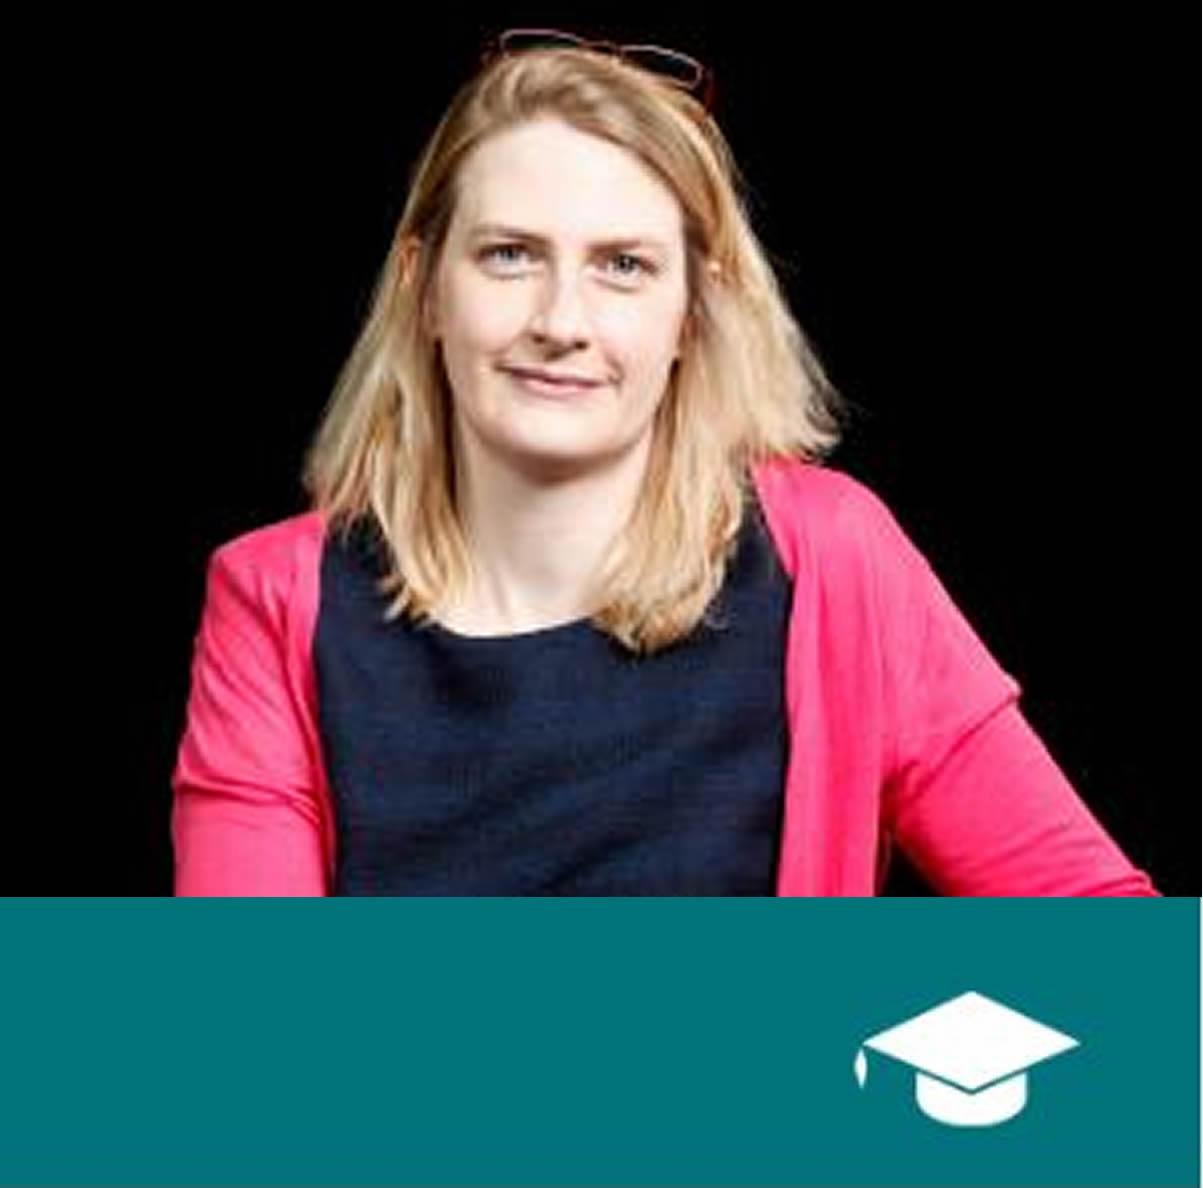 Fiche Expertalia Caroline Van wynsberghe